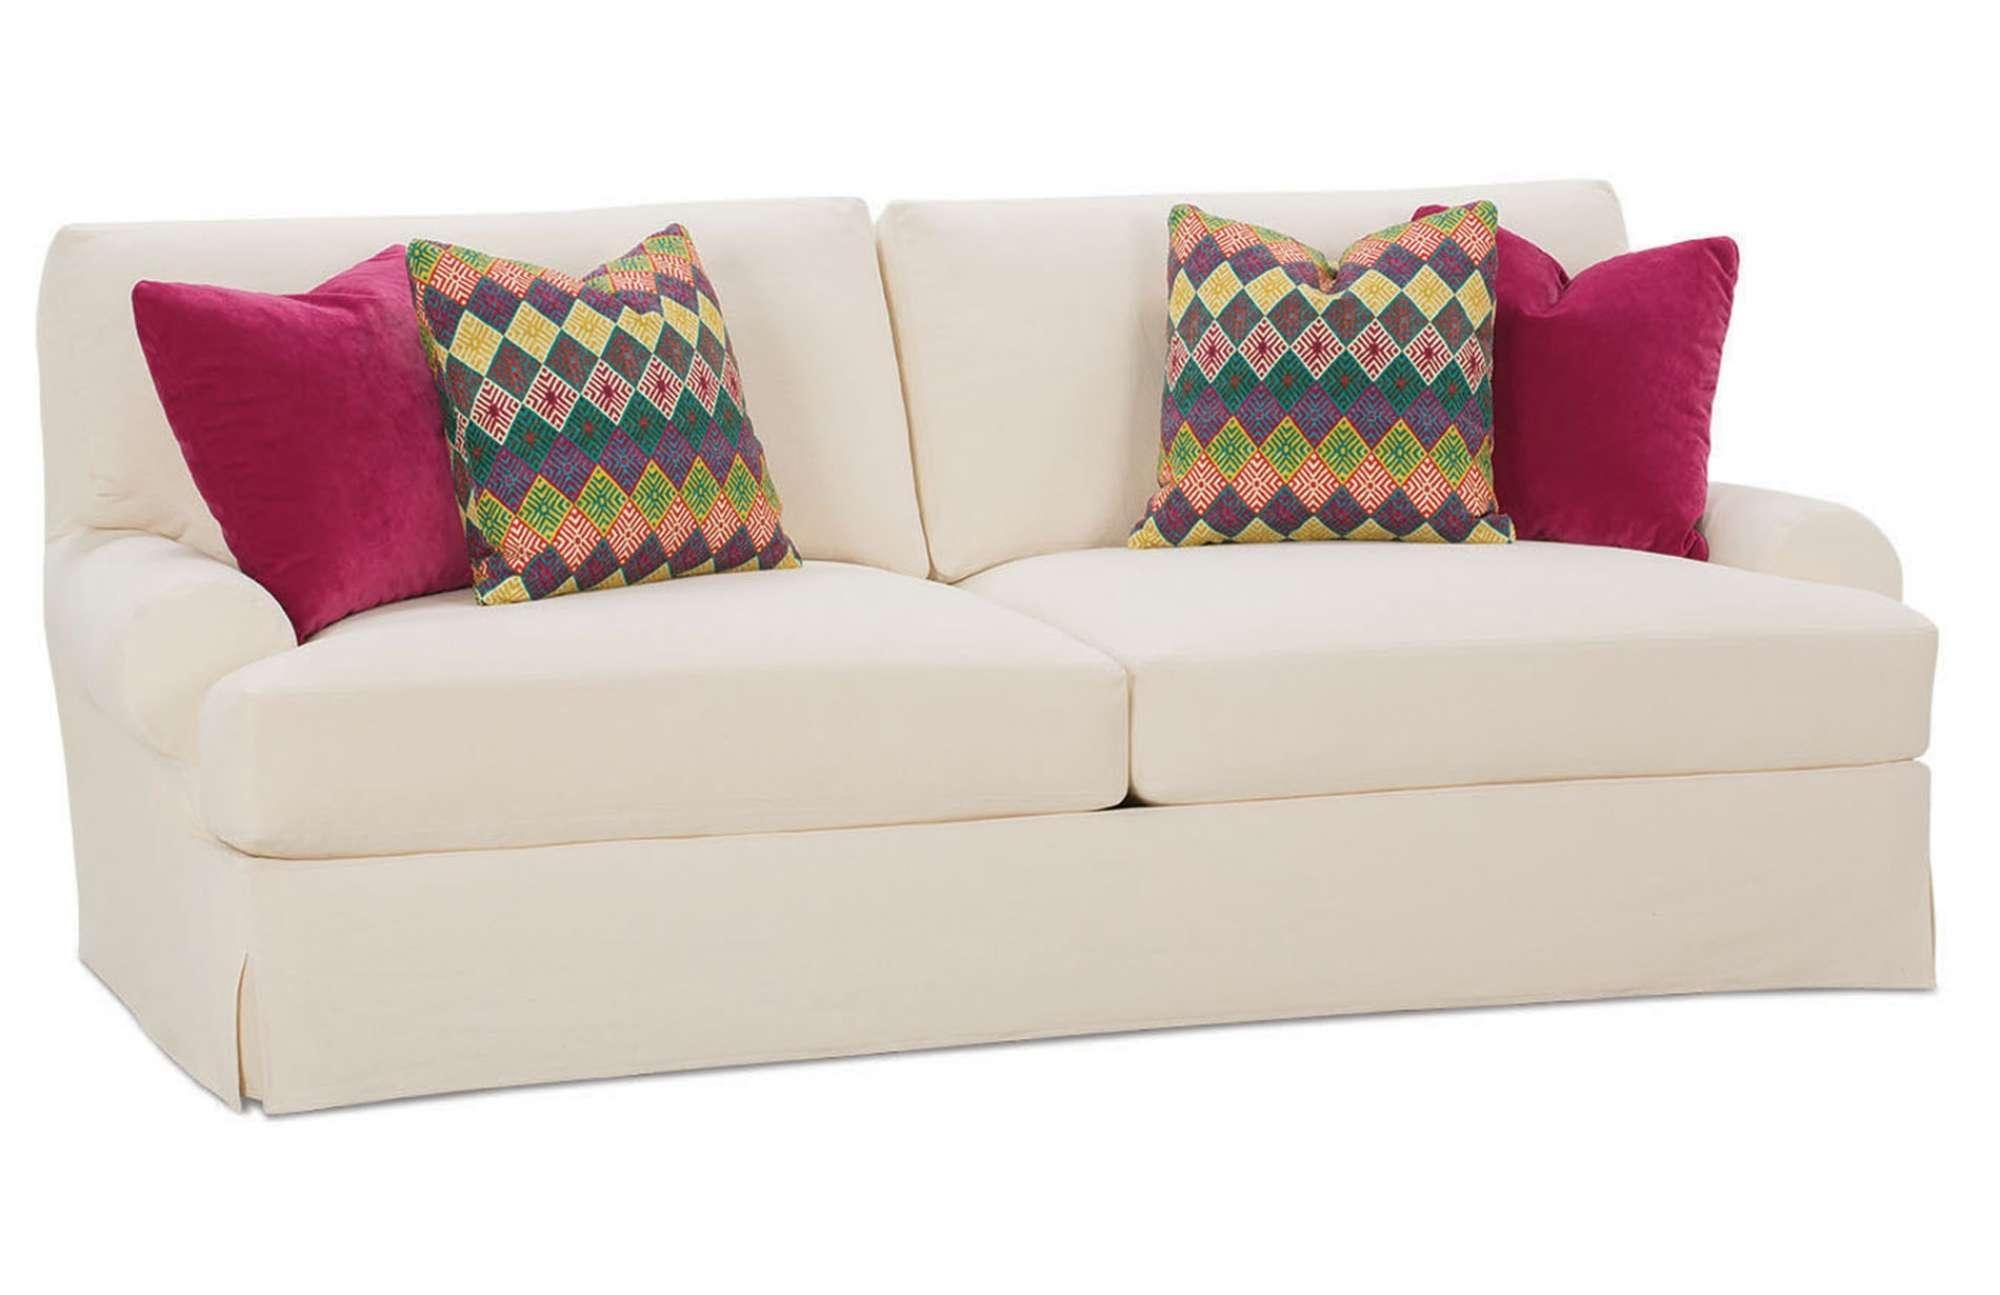 Sofa Ideas Canvas Slipcover Sofas Explore 12 of 20 s